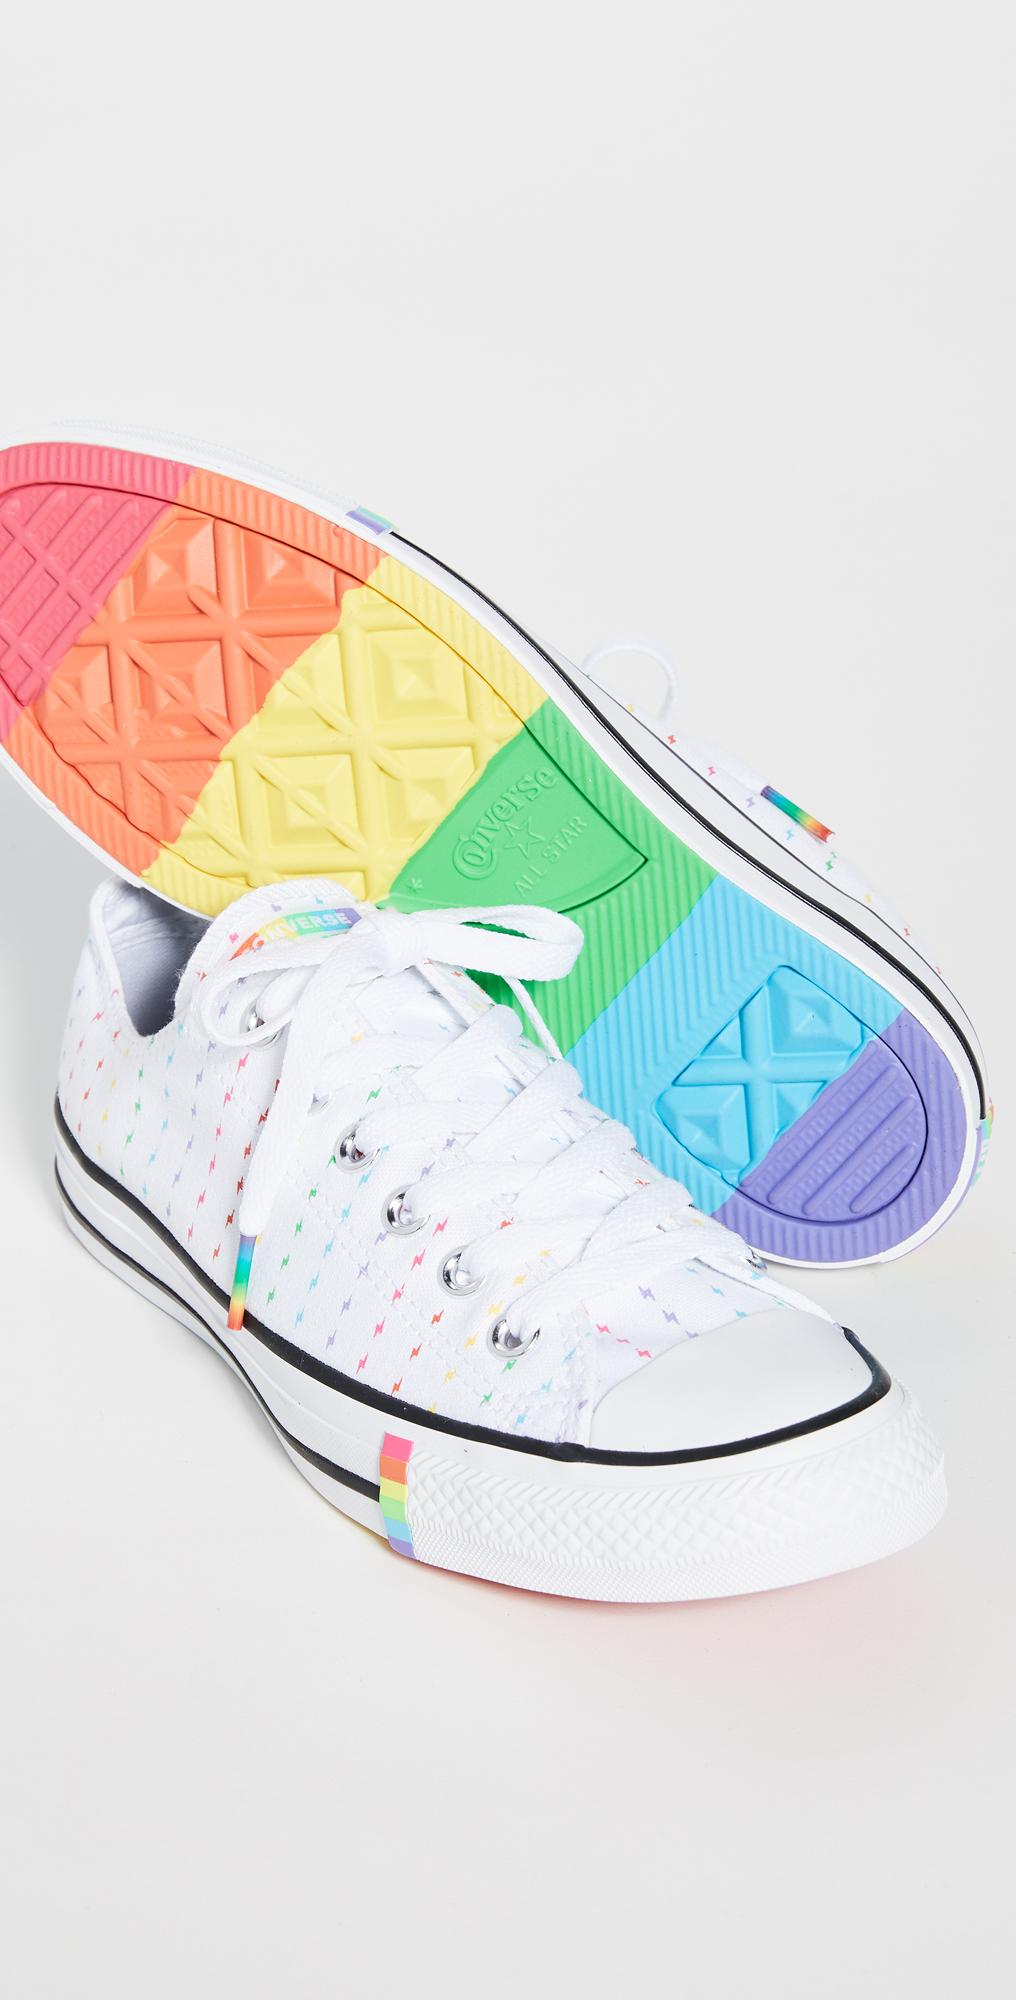 Converse Pride Classic Ox Sneakers